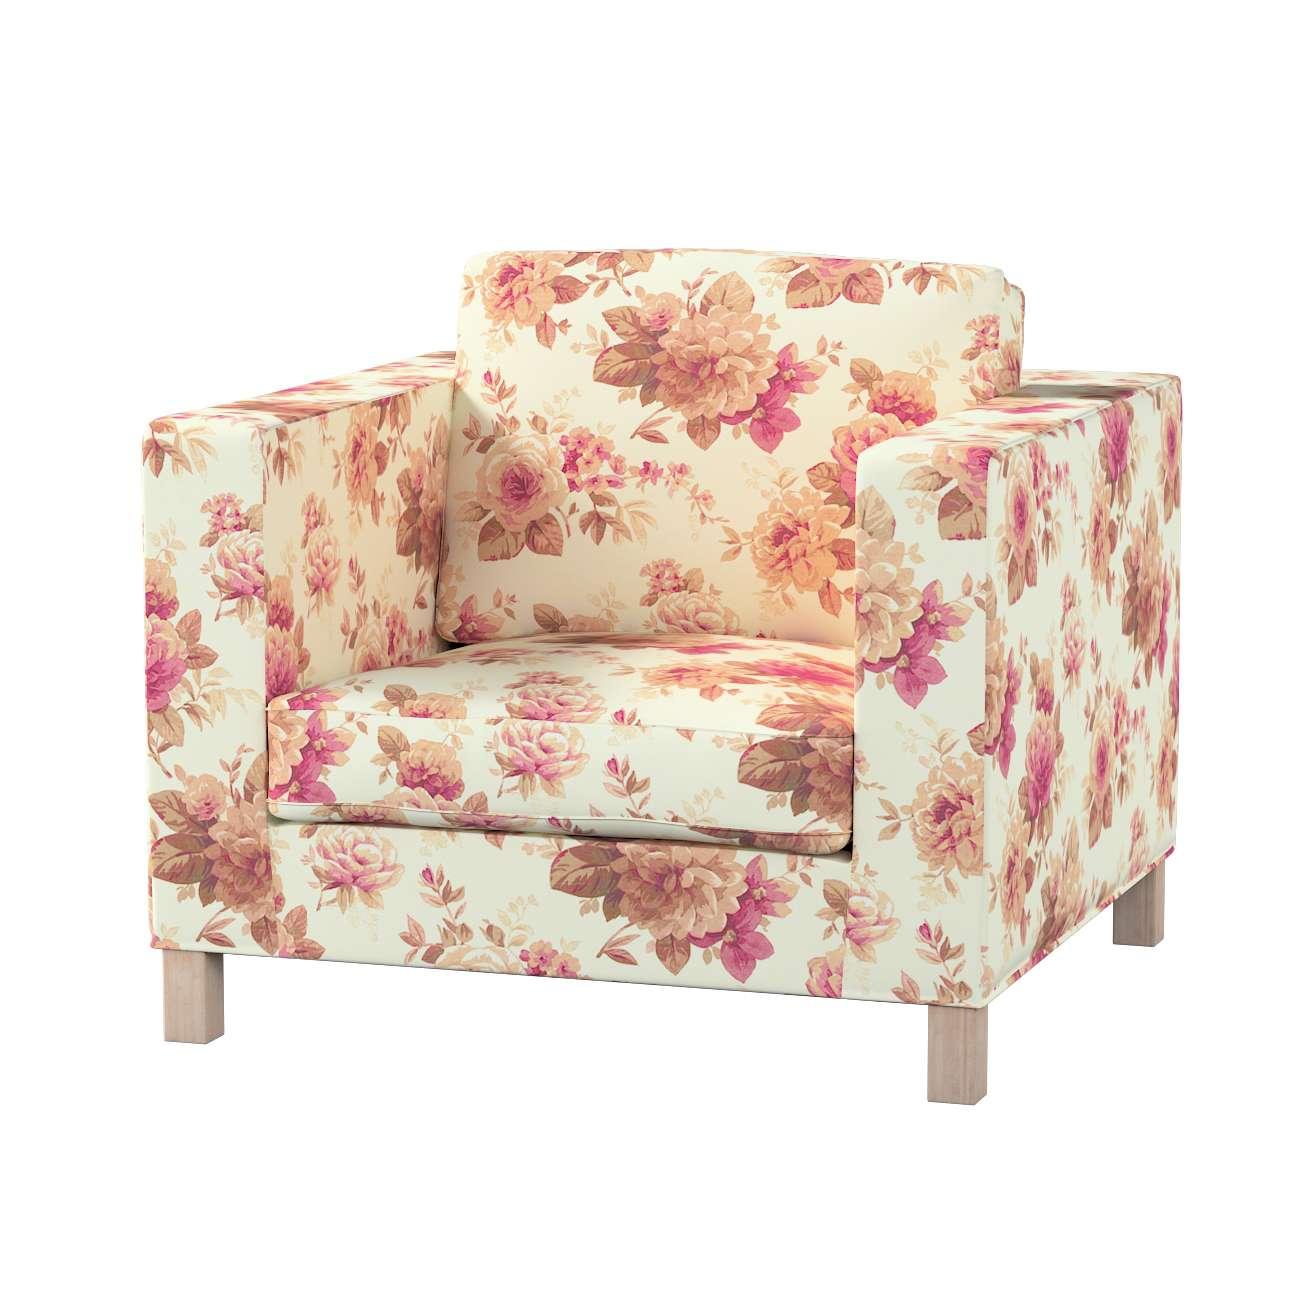 Pokrowiec na fotel Karlanda, krótki fotel Karlanda w kolekcji Mirella, tkanina: 141-06